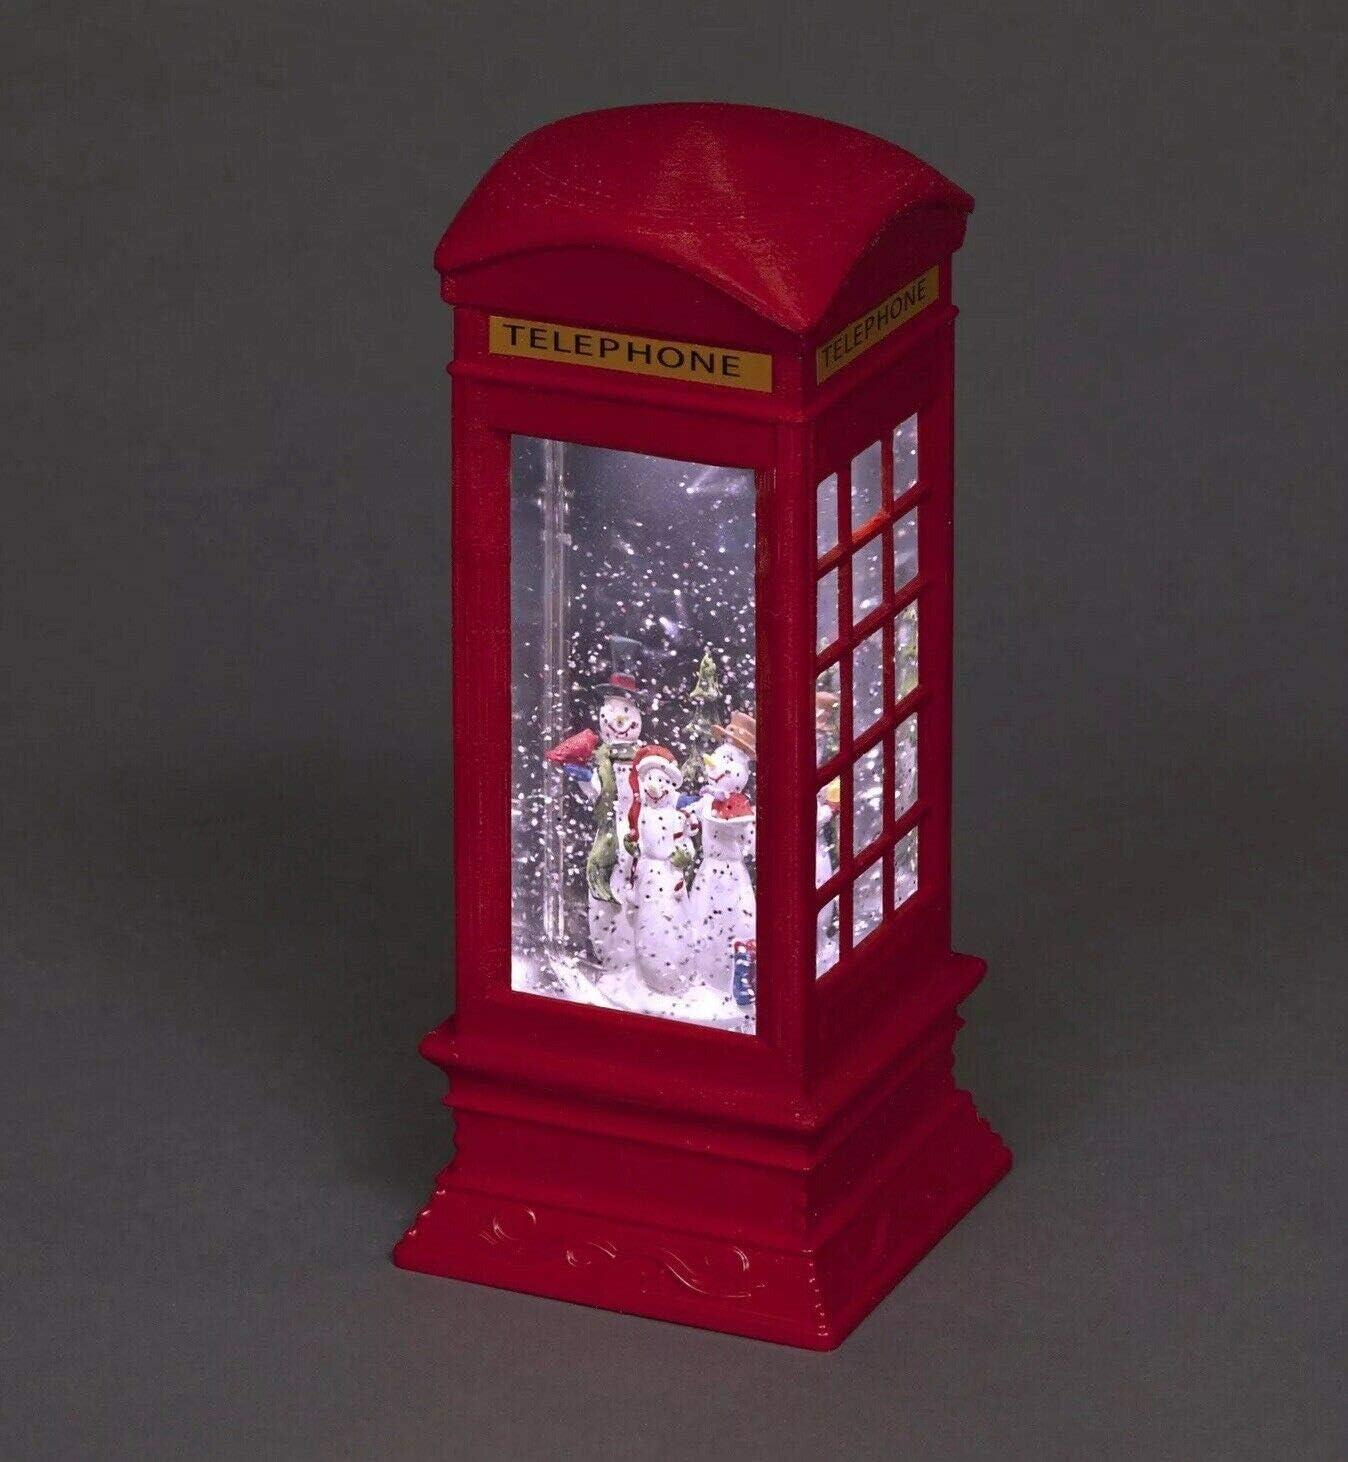 Snowman Design Mask /& Co Premier Christmas Glitter Water Spinner Telephone Box Decoration